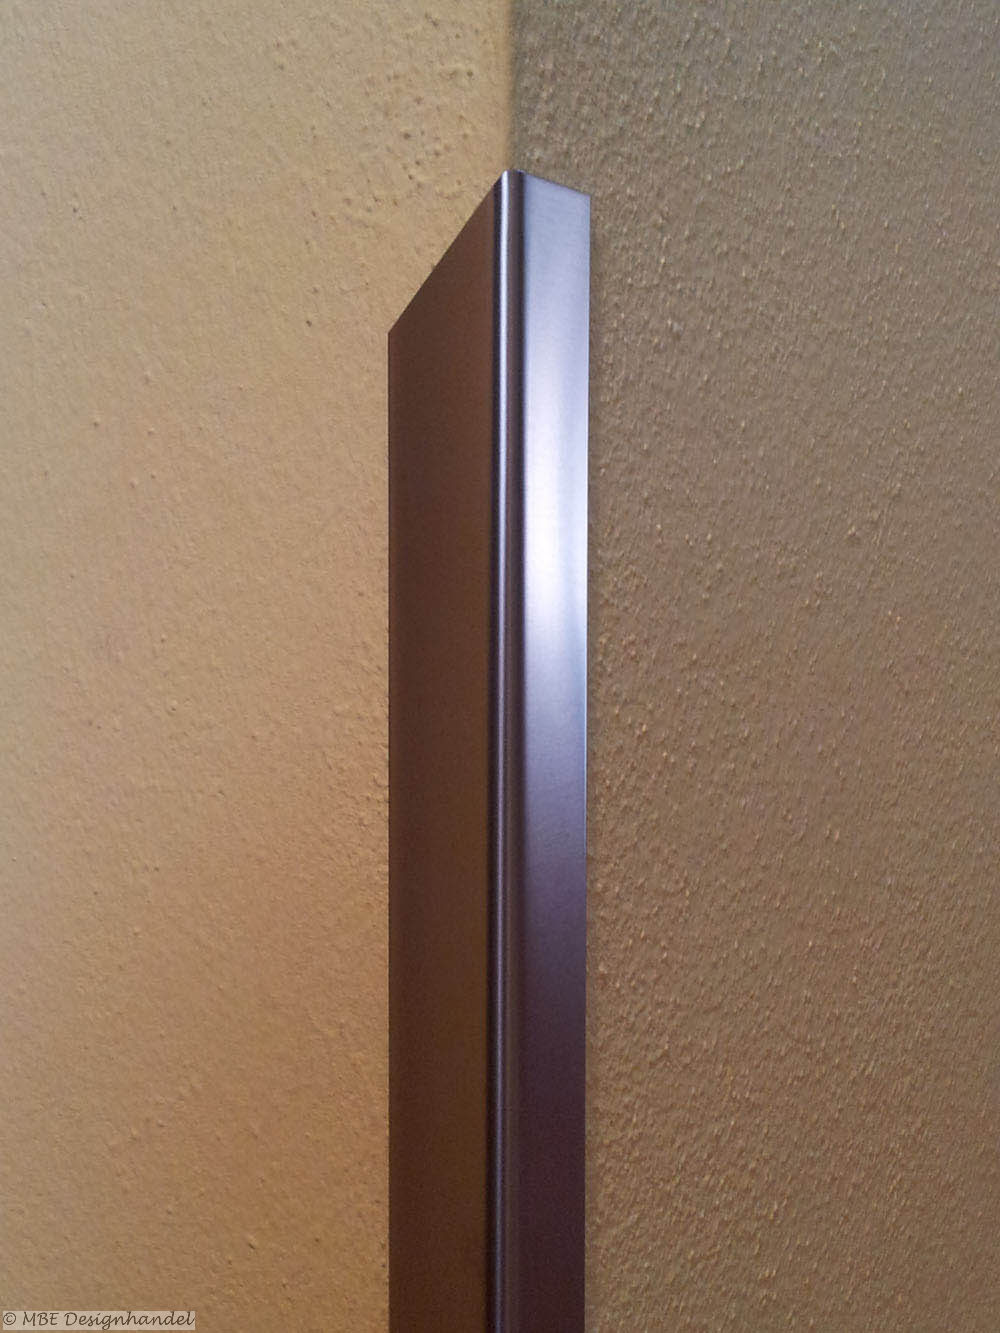 kantenschutz 60x60x1500mm, aus edelstahl 1mm gebürstet